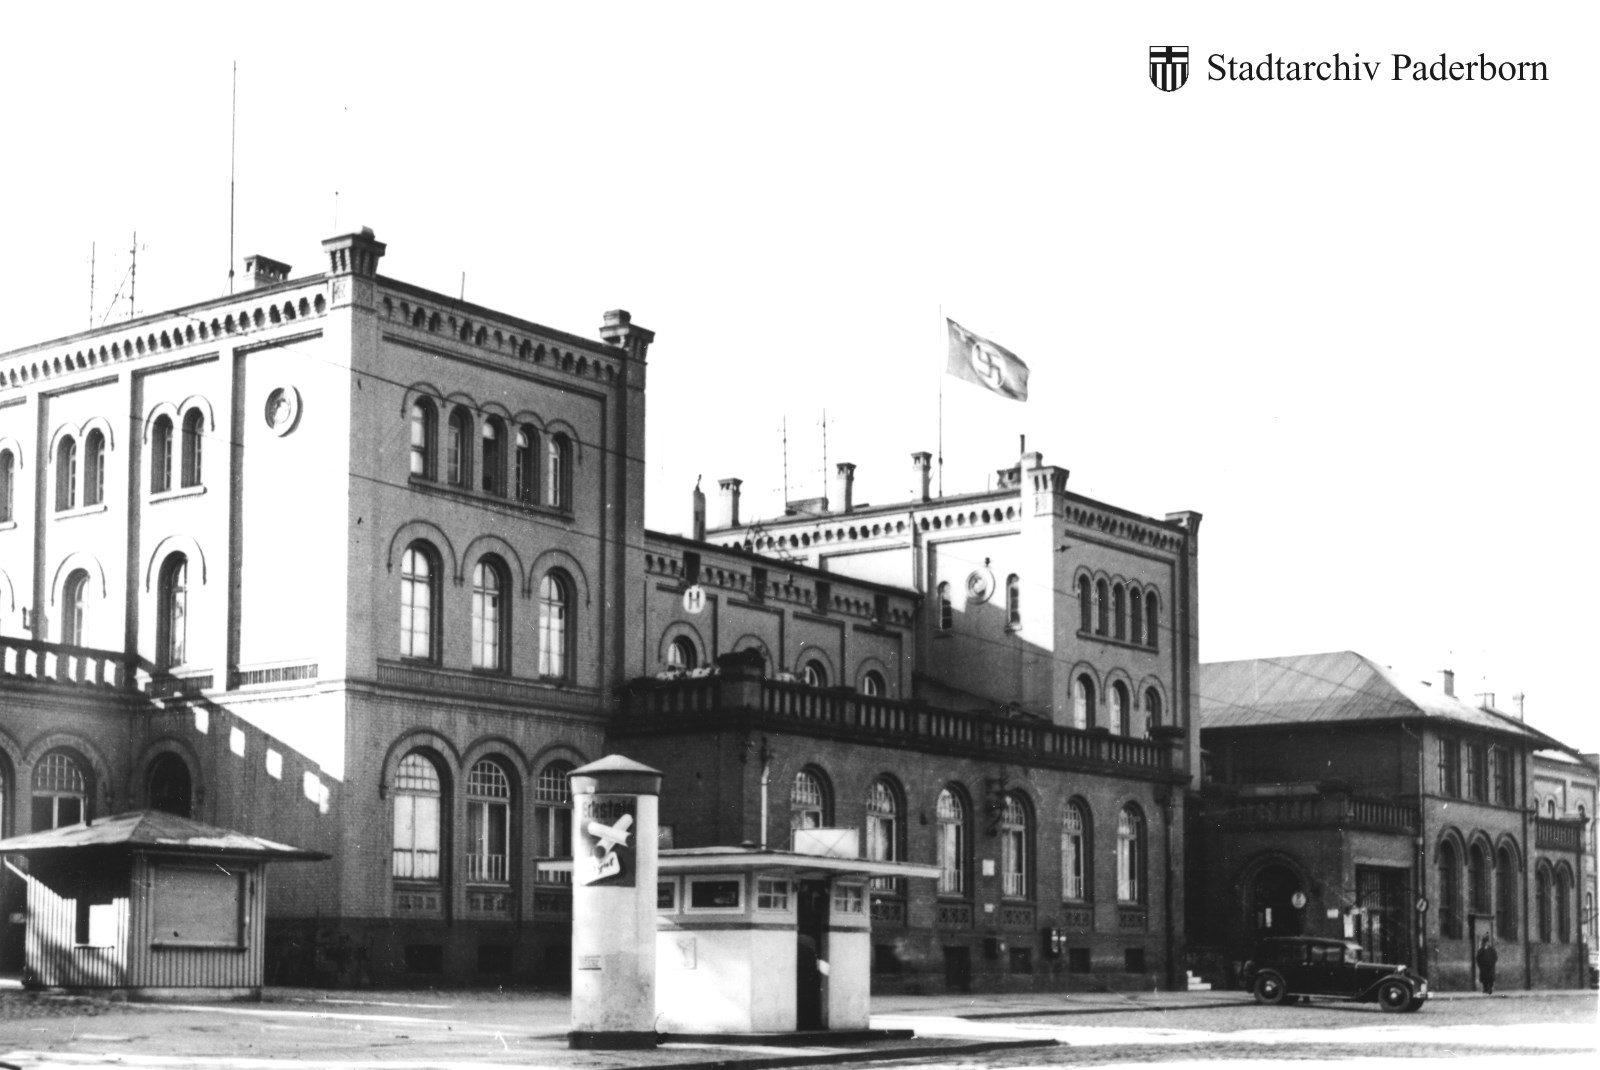 08 Hauptbahnhof1933bis1945